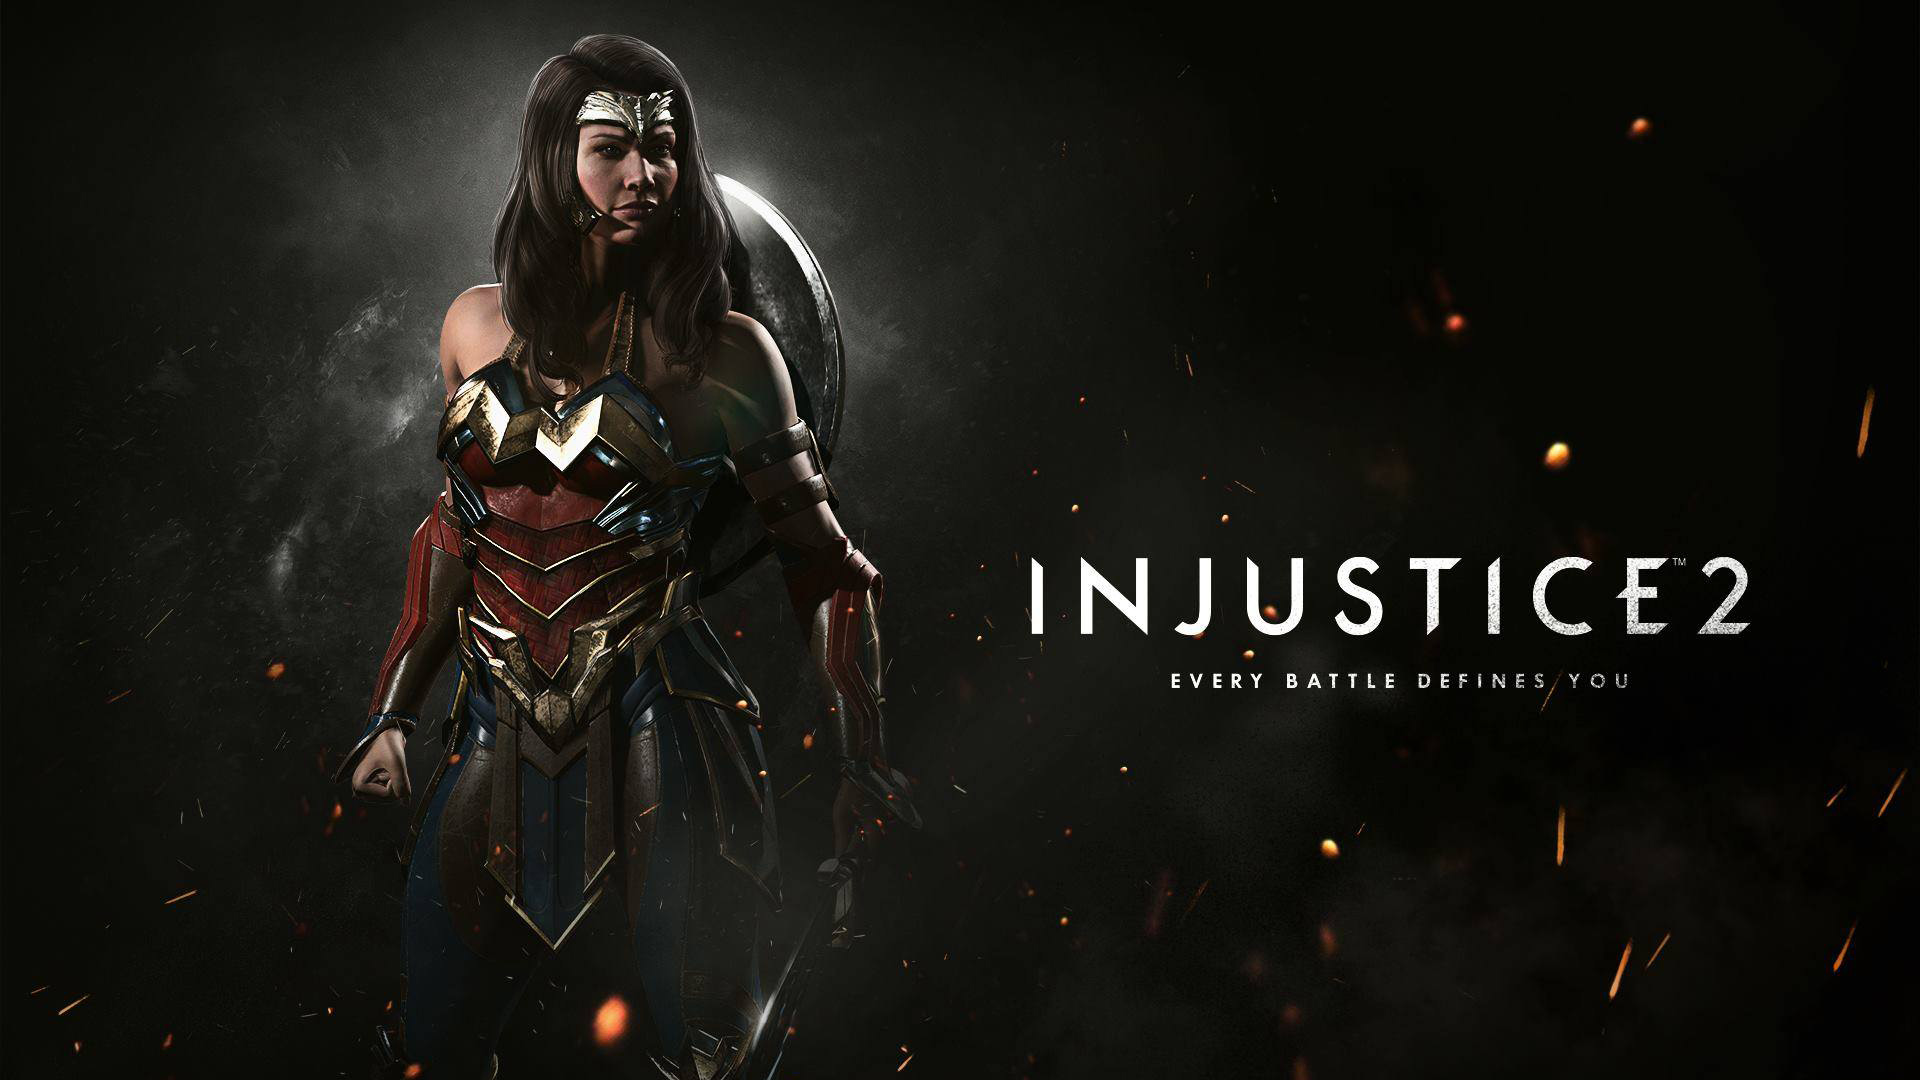 Wonder woman in injustice 2 hd games 4k wallpapers images wonder woman in injustice 2 voltagebd Choice Image